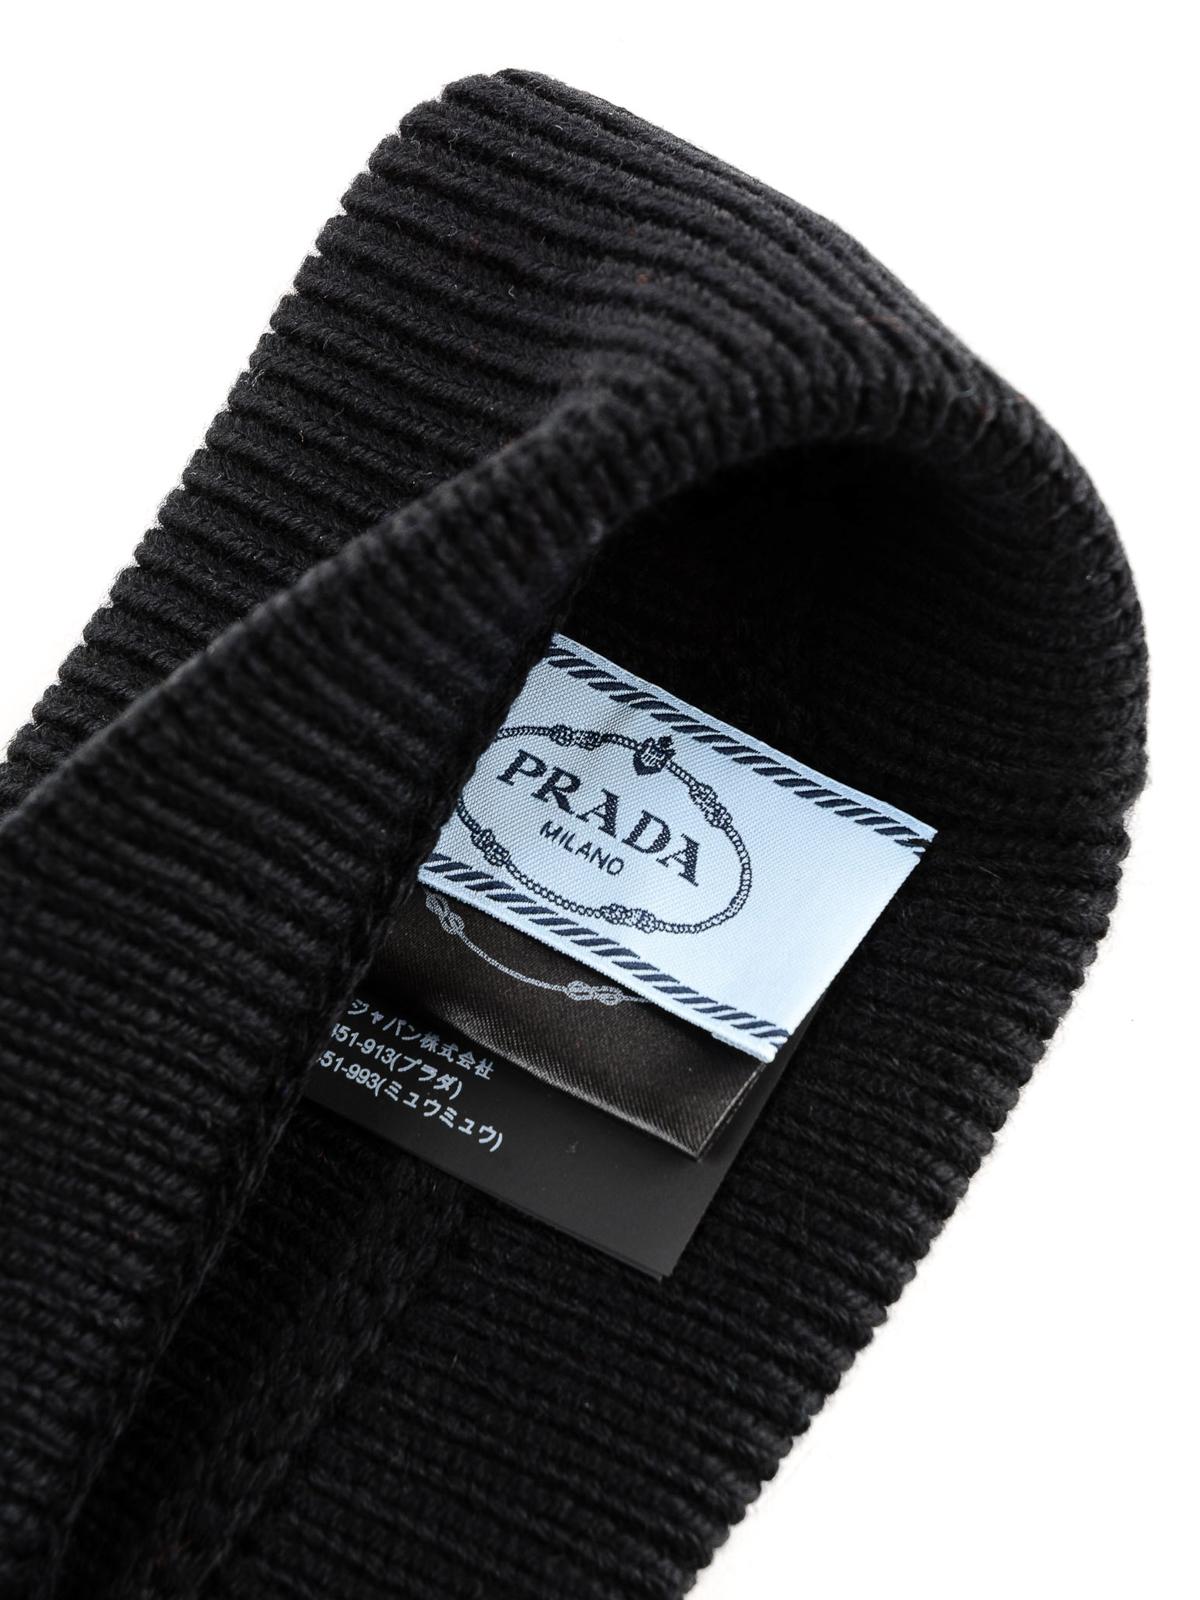 d76f37126fc Prada - Black logo patch wool beanie - beanies - 27379.MPG 002 ...